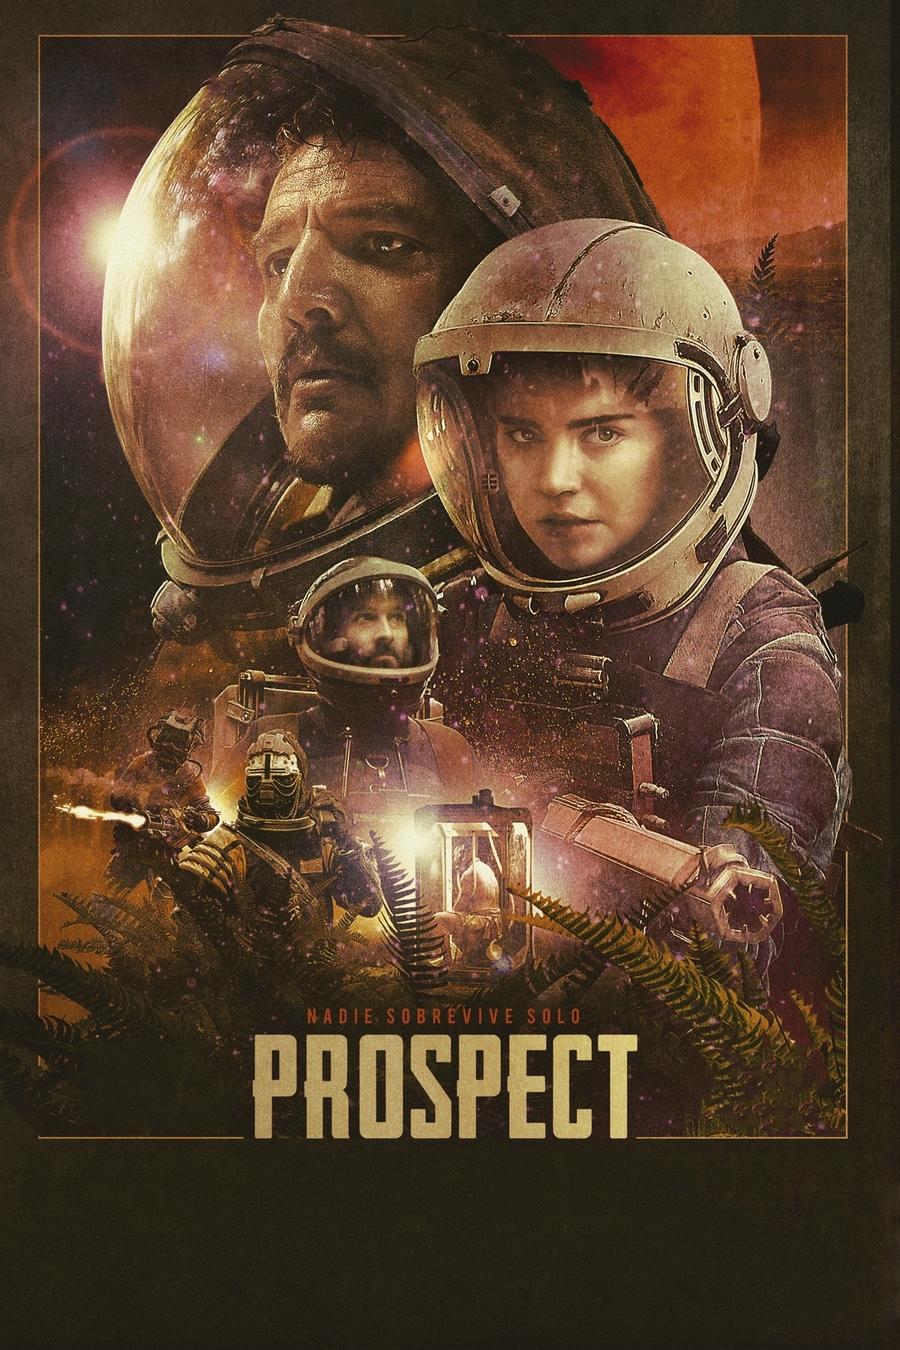 Prospect